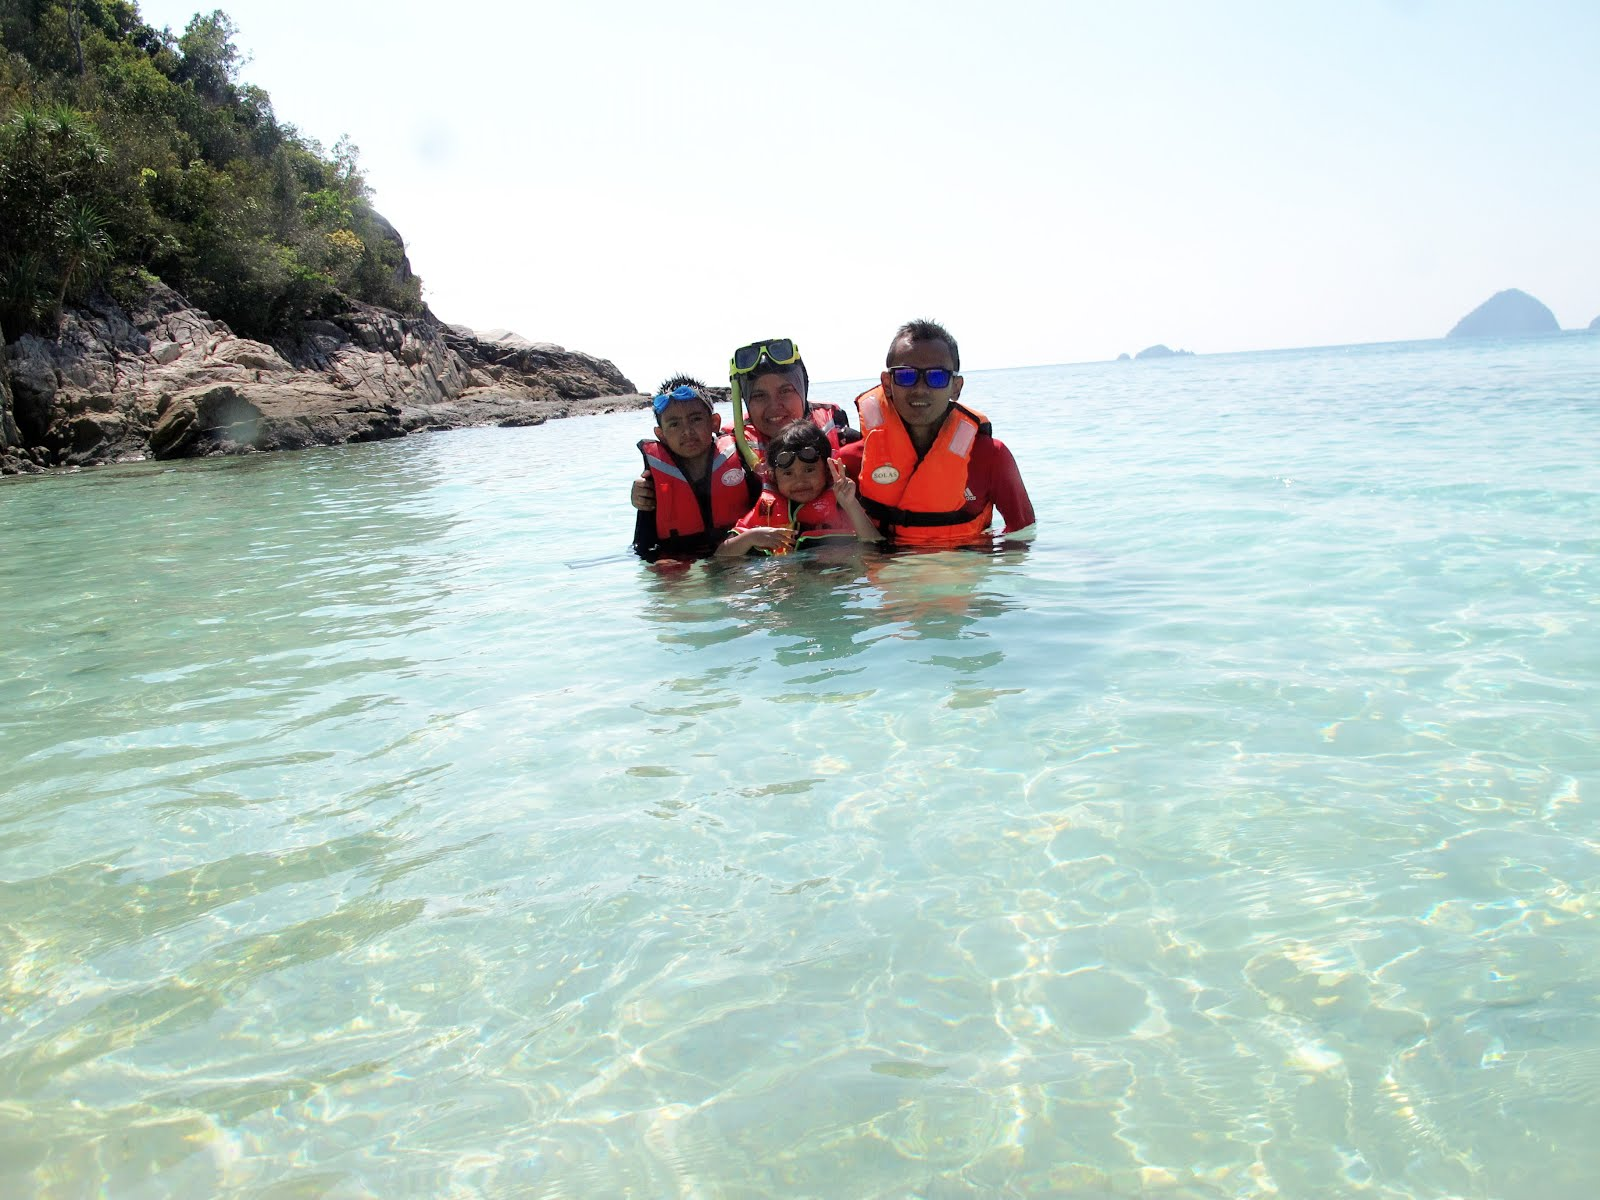 Pulau Perhentian 2015